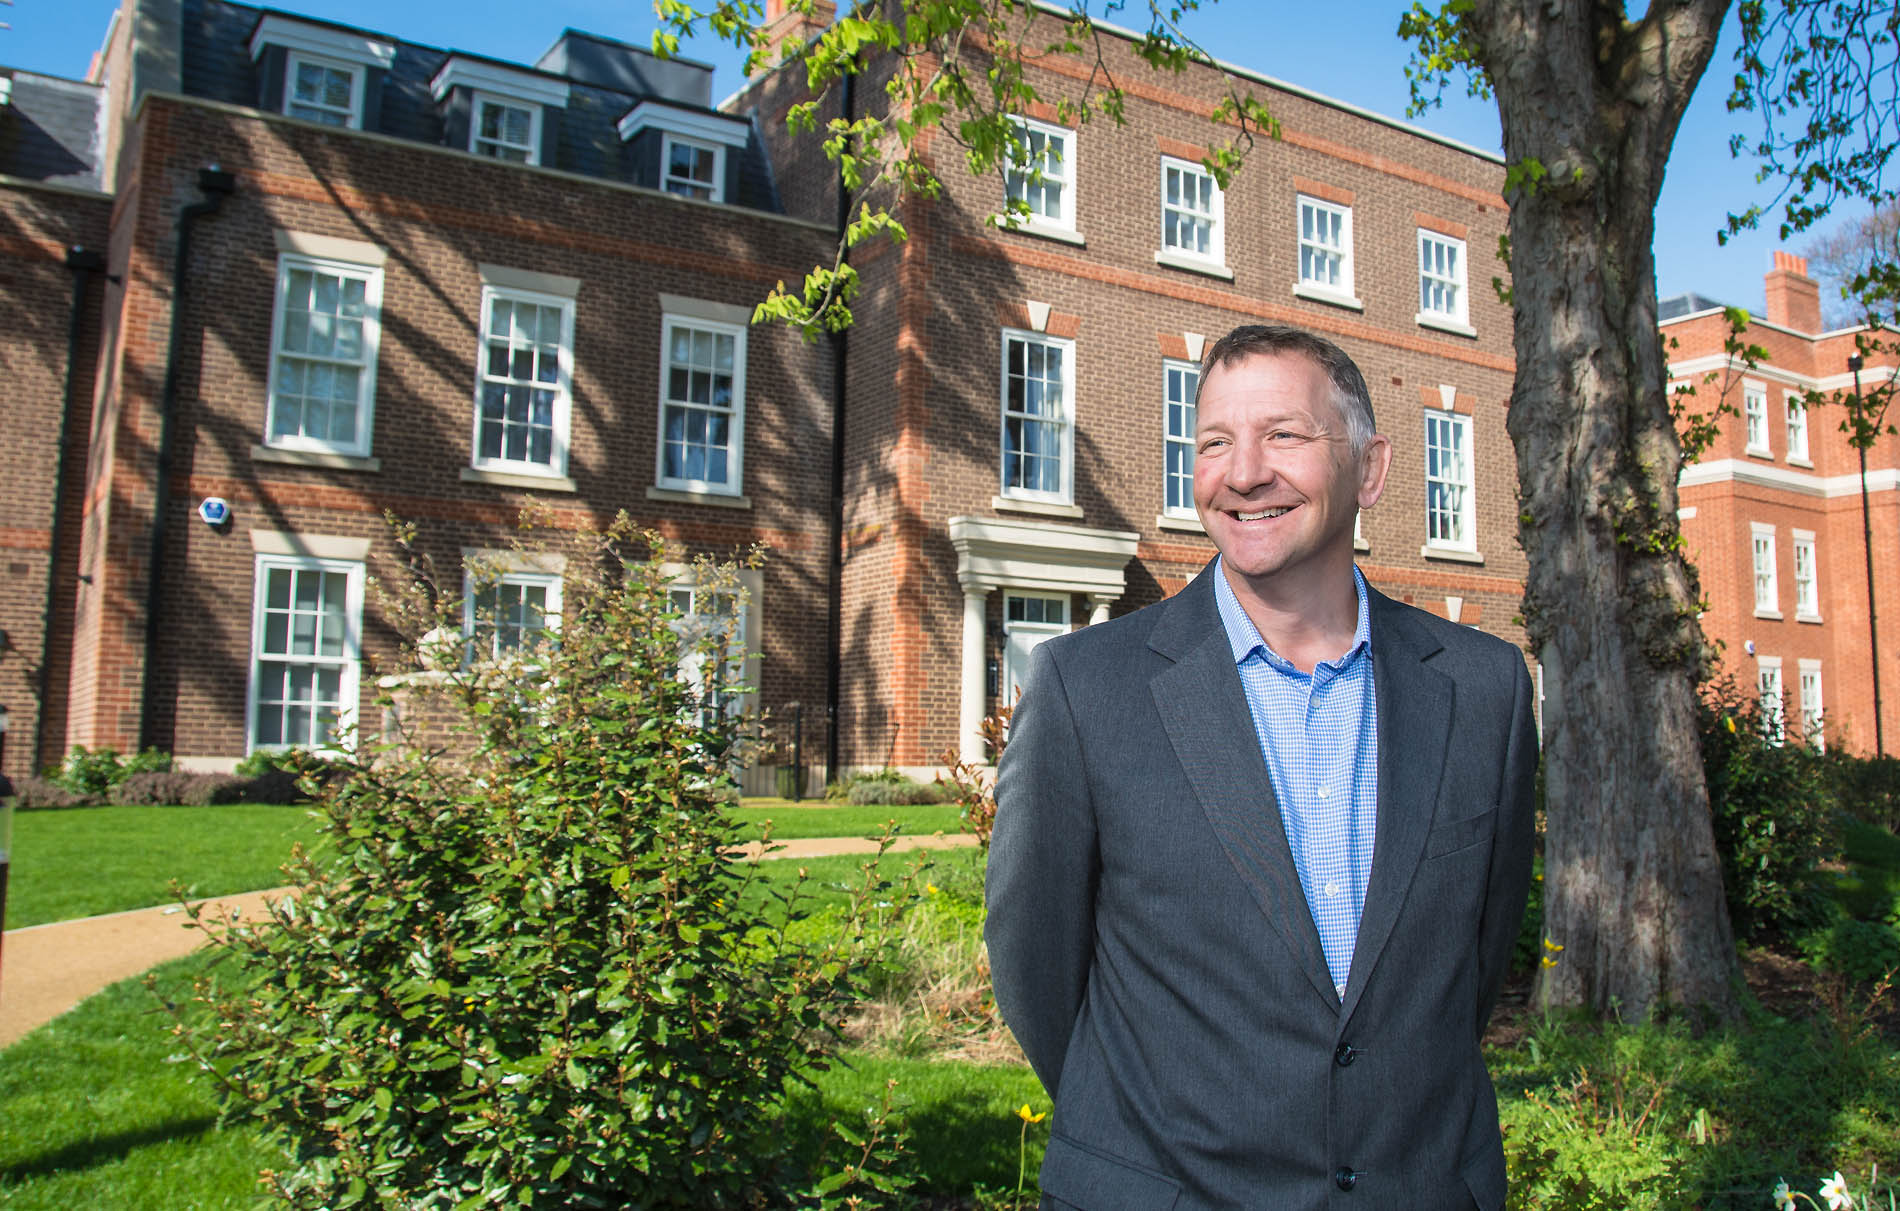 Web designers Belfast portfolio web site - photo 1216 of man in front of apartments by veetoo design Belfast, Northern Ireland, UK.